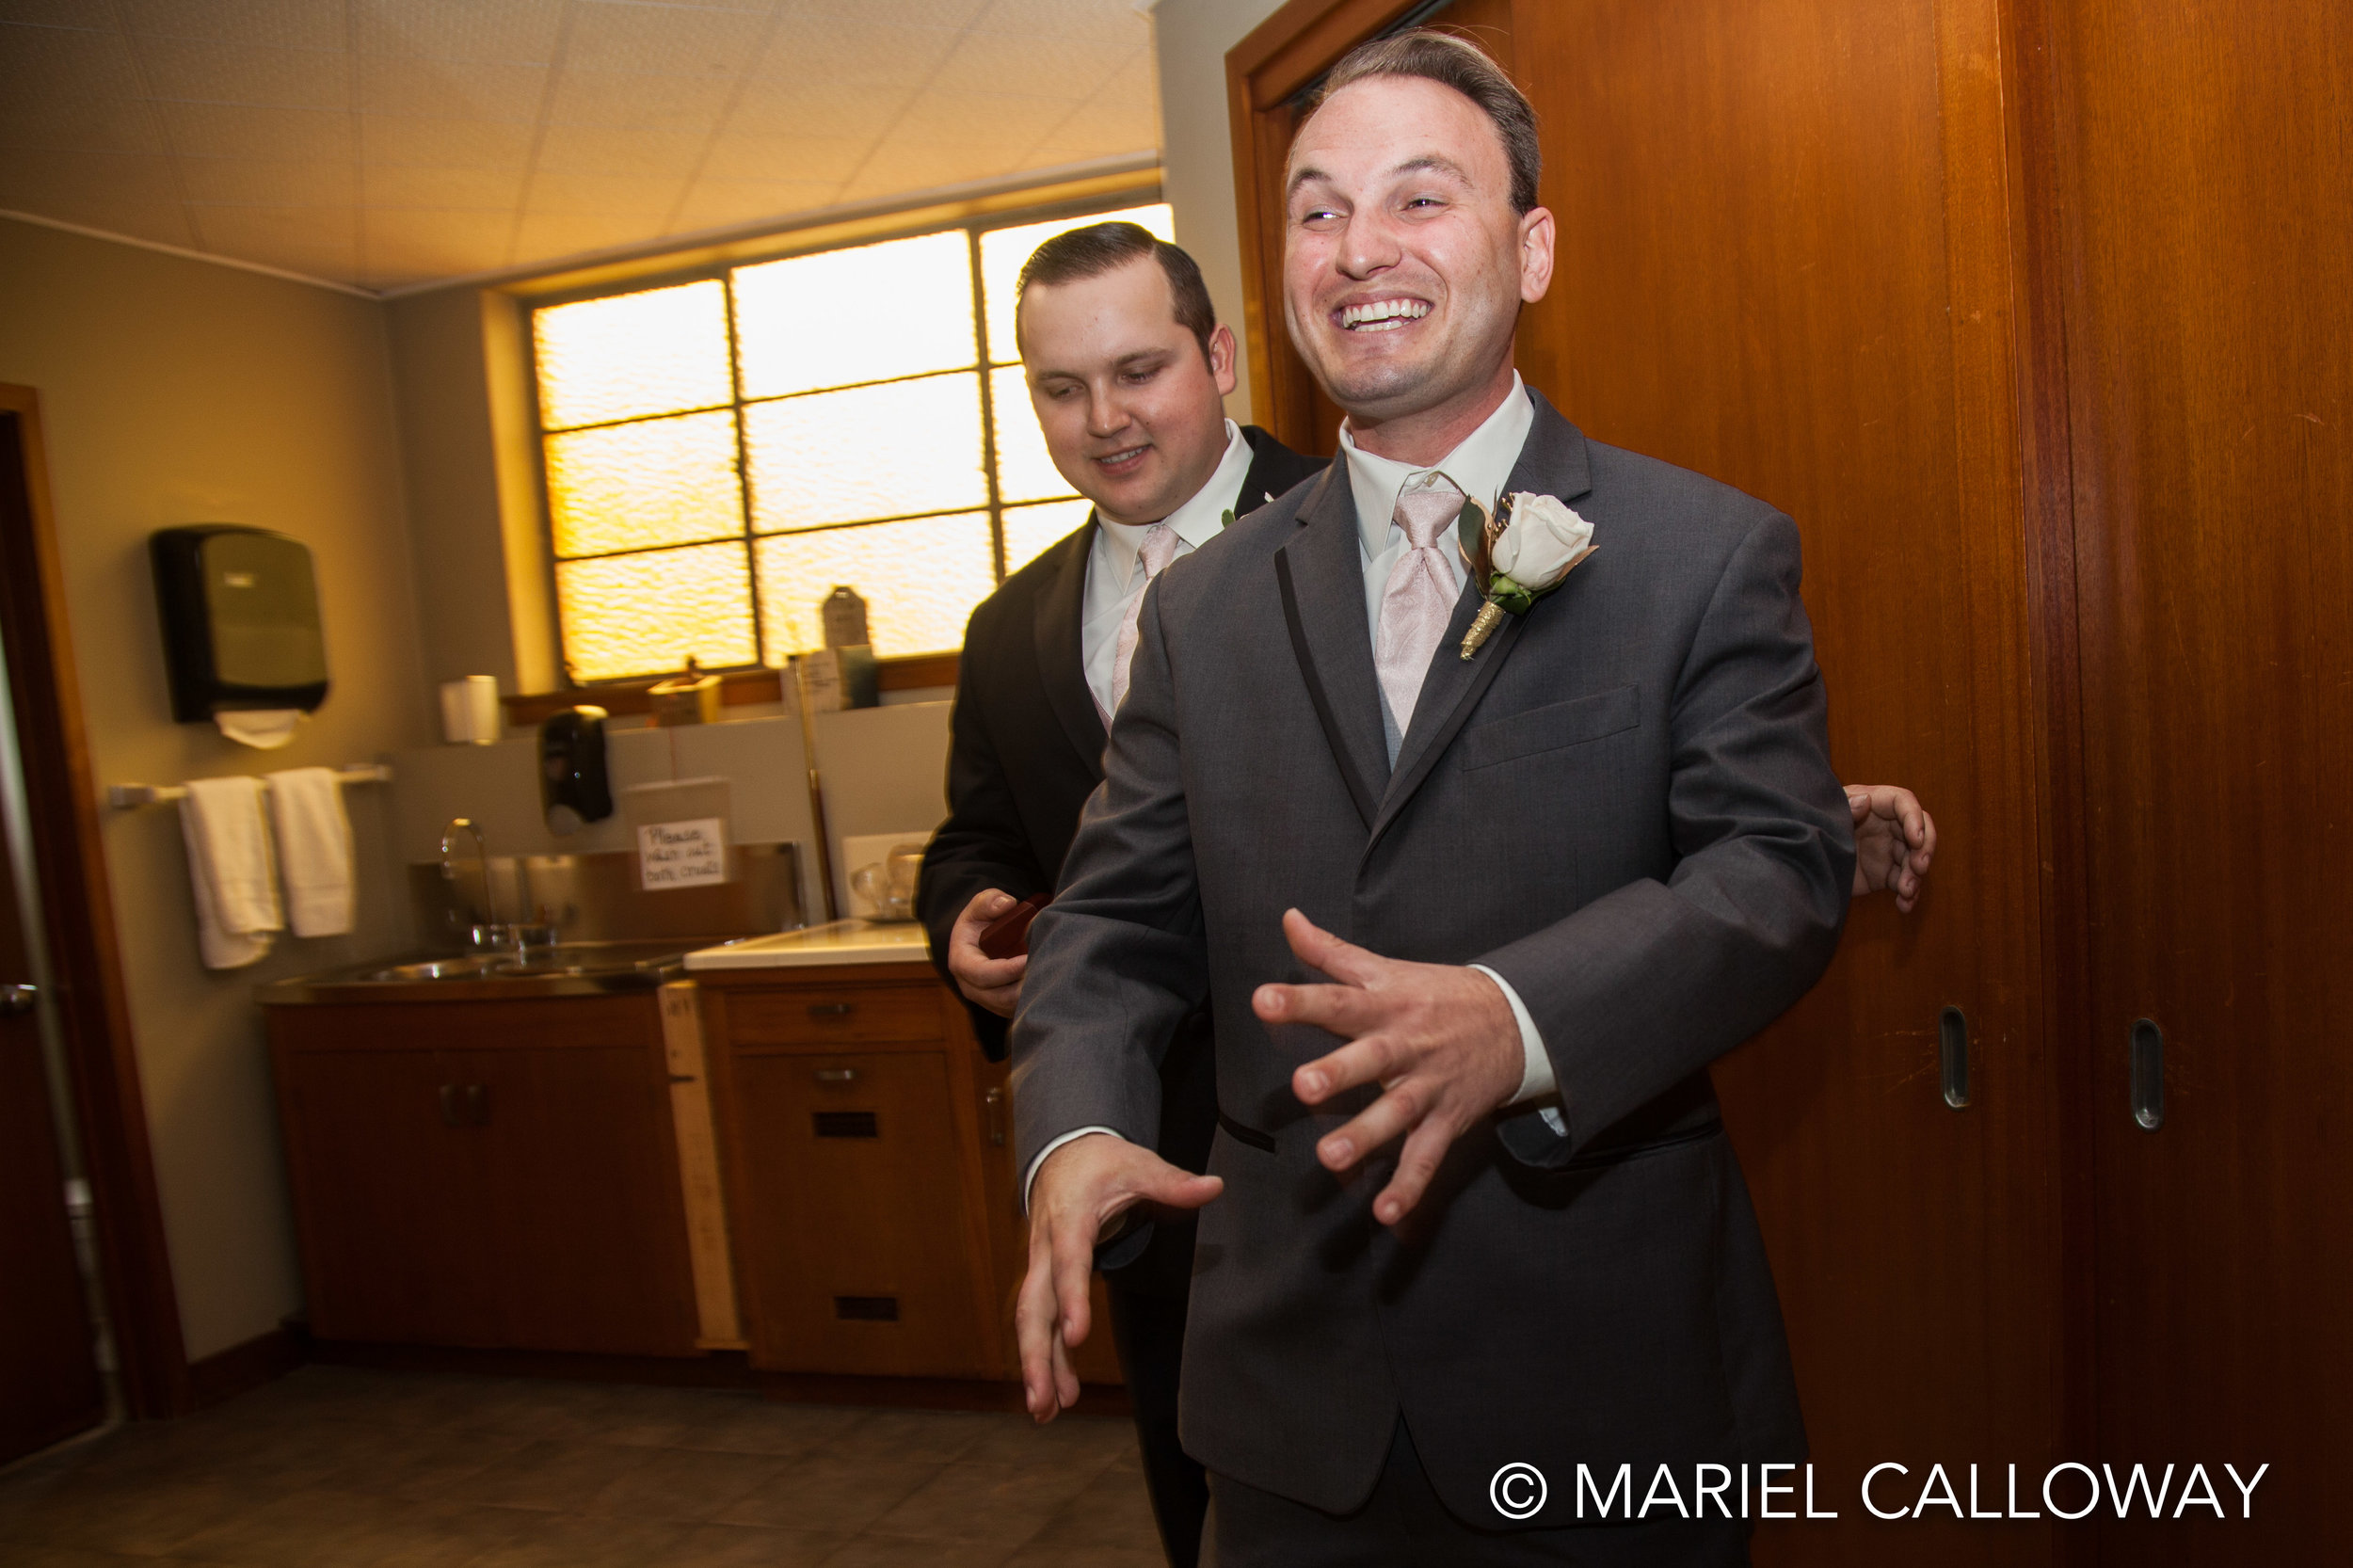 Mariel-Calloway-Los-Angeles-Wedding-Photography-Rossi-39.jpg